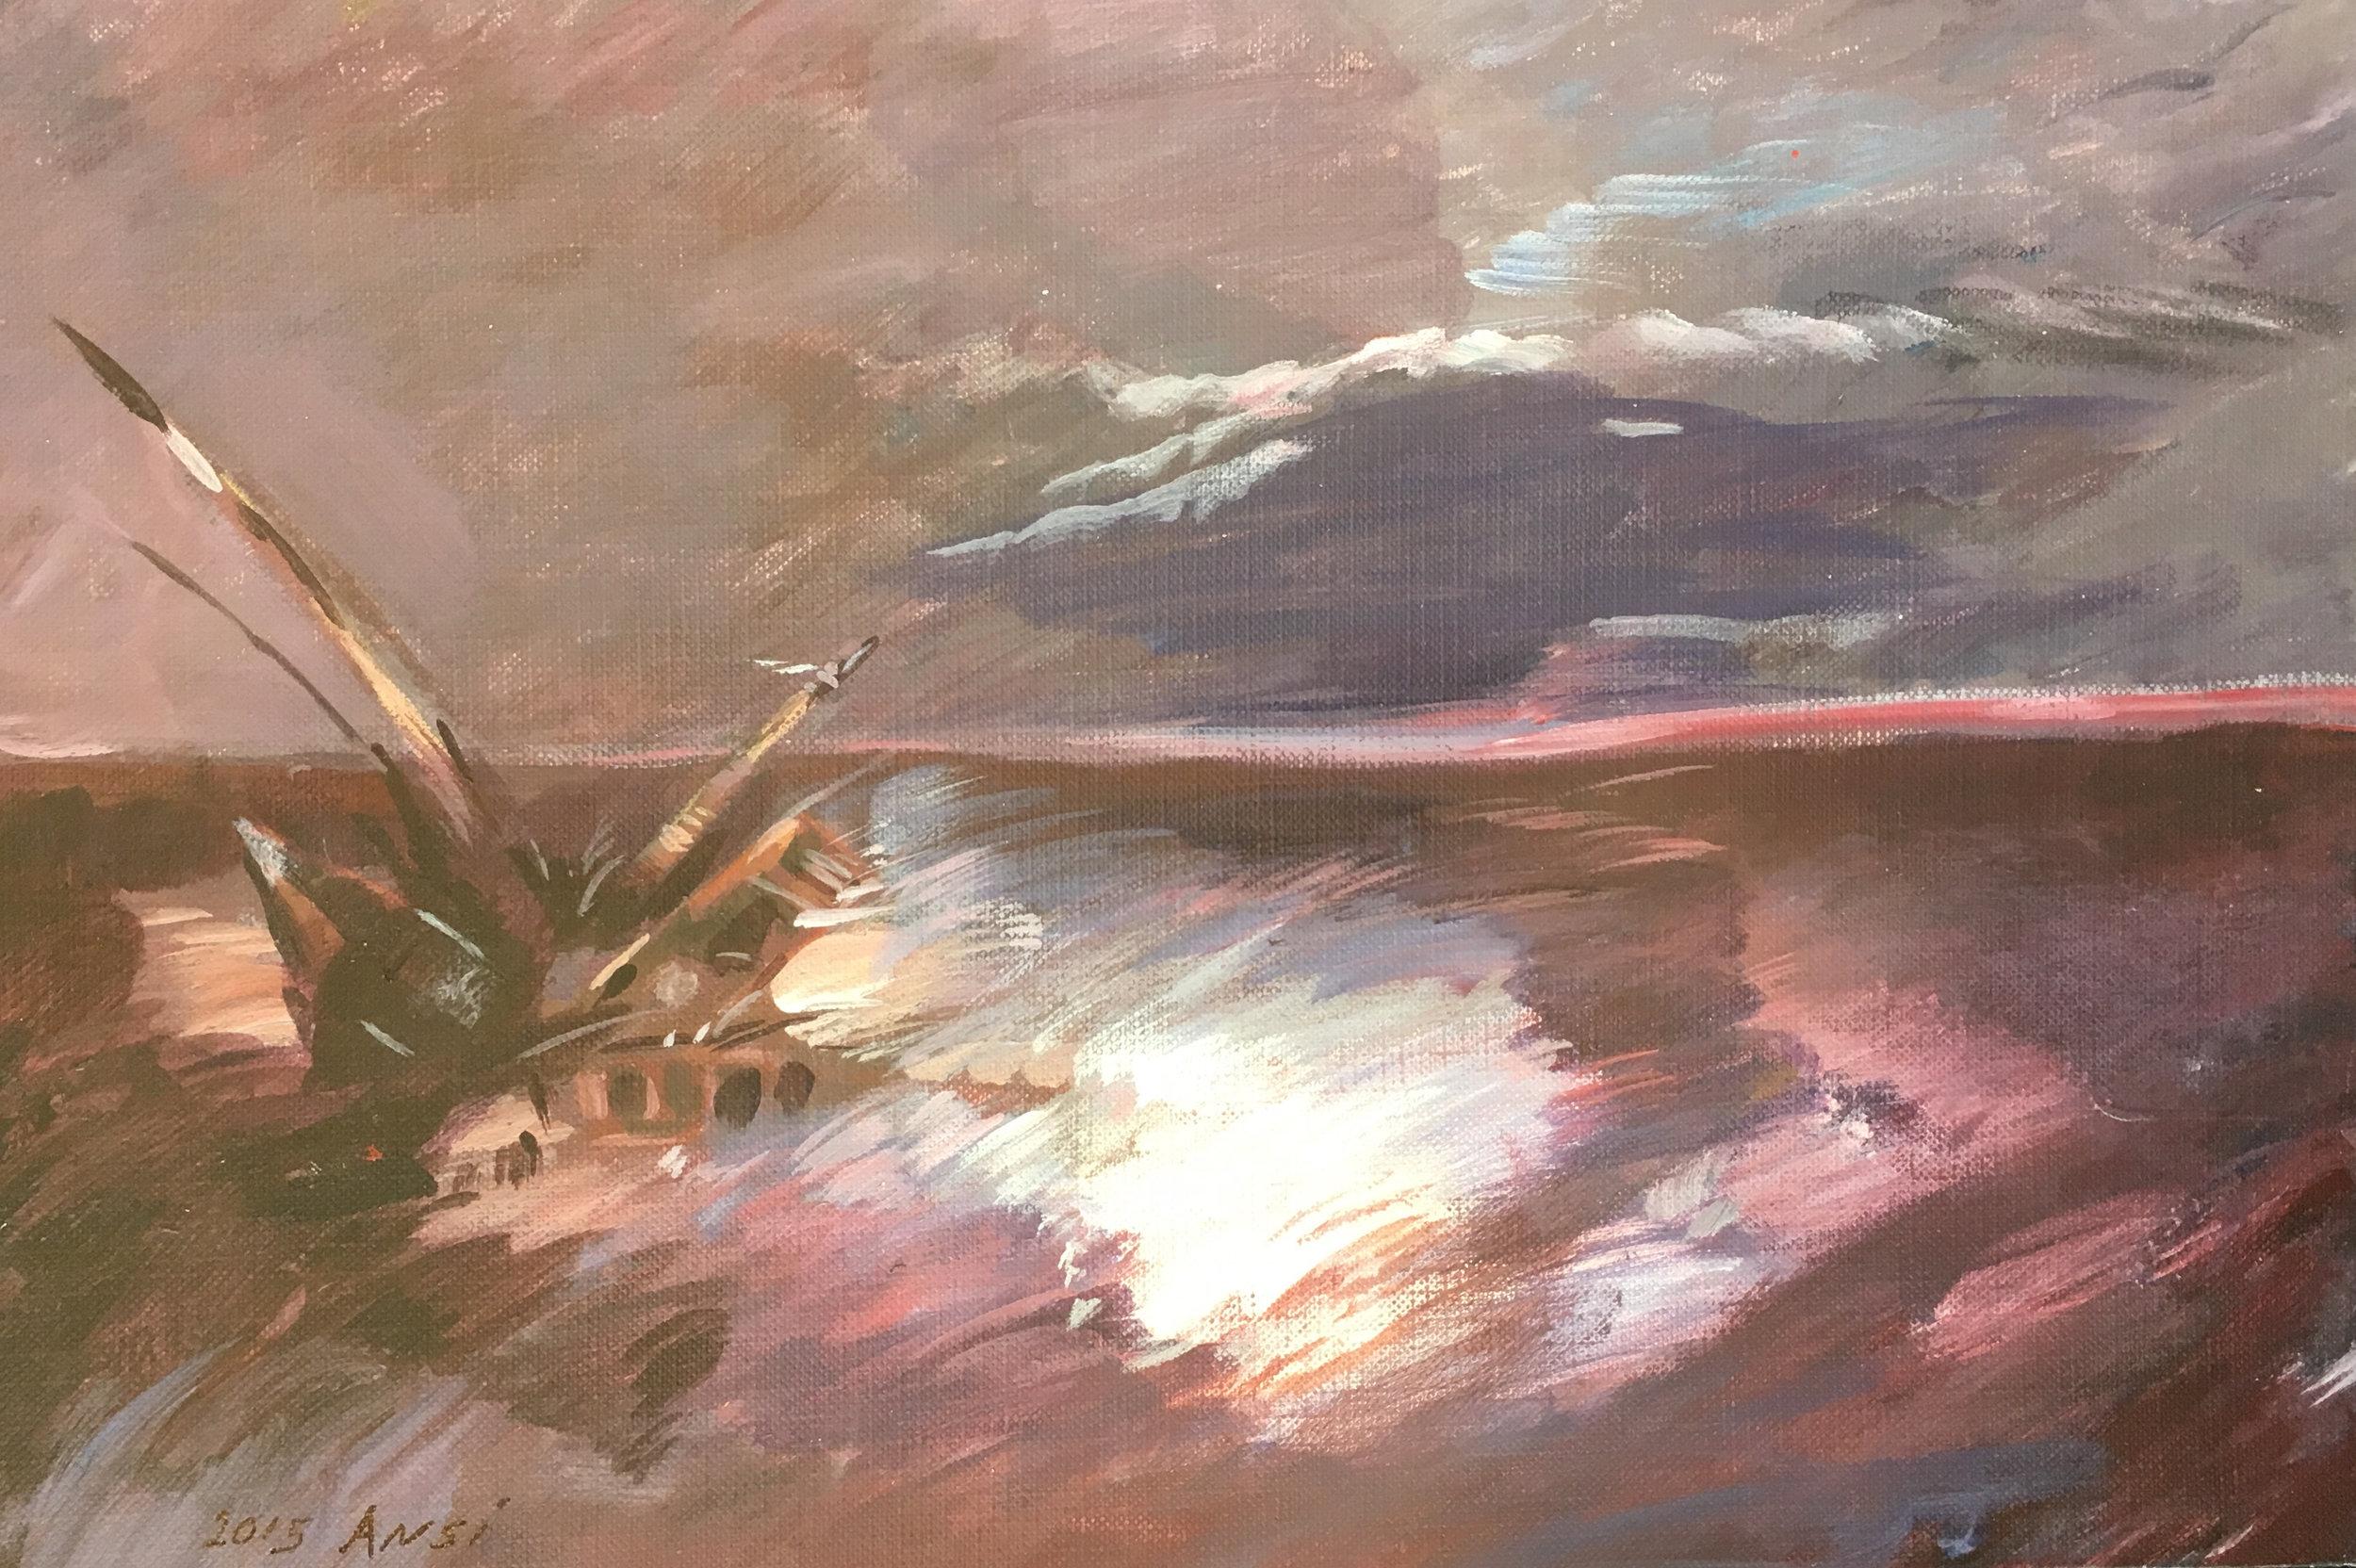 Muhammad Ansi, Shipwreck, 2015.